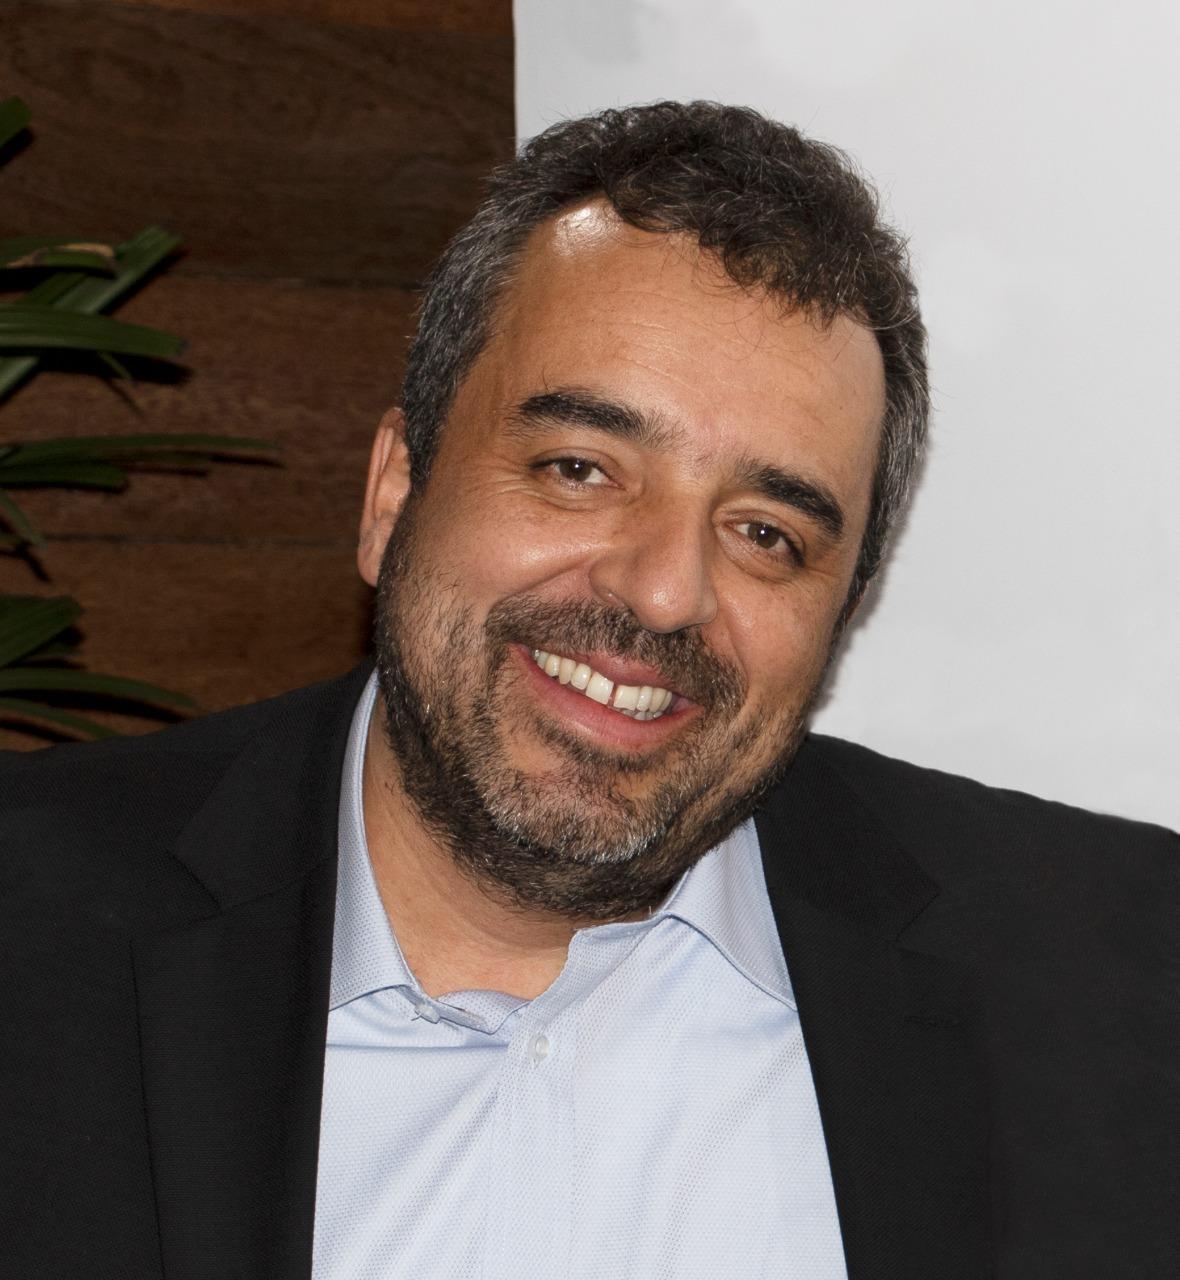 Philippe Vergnaud